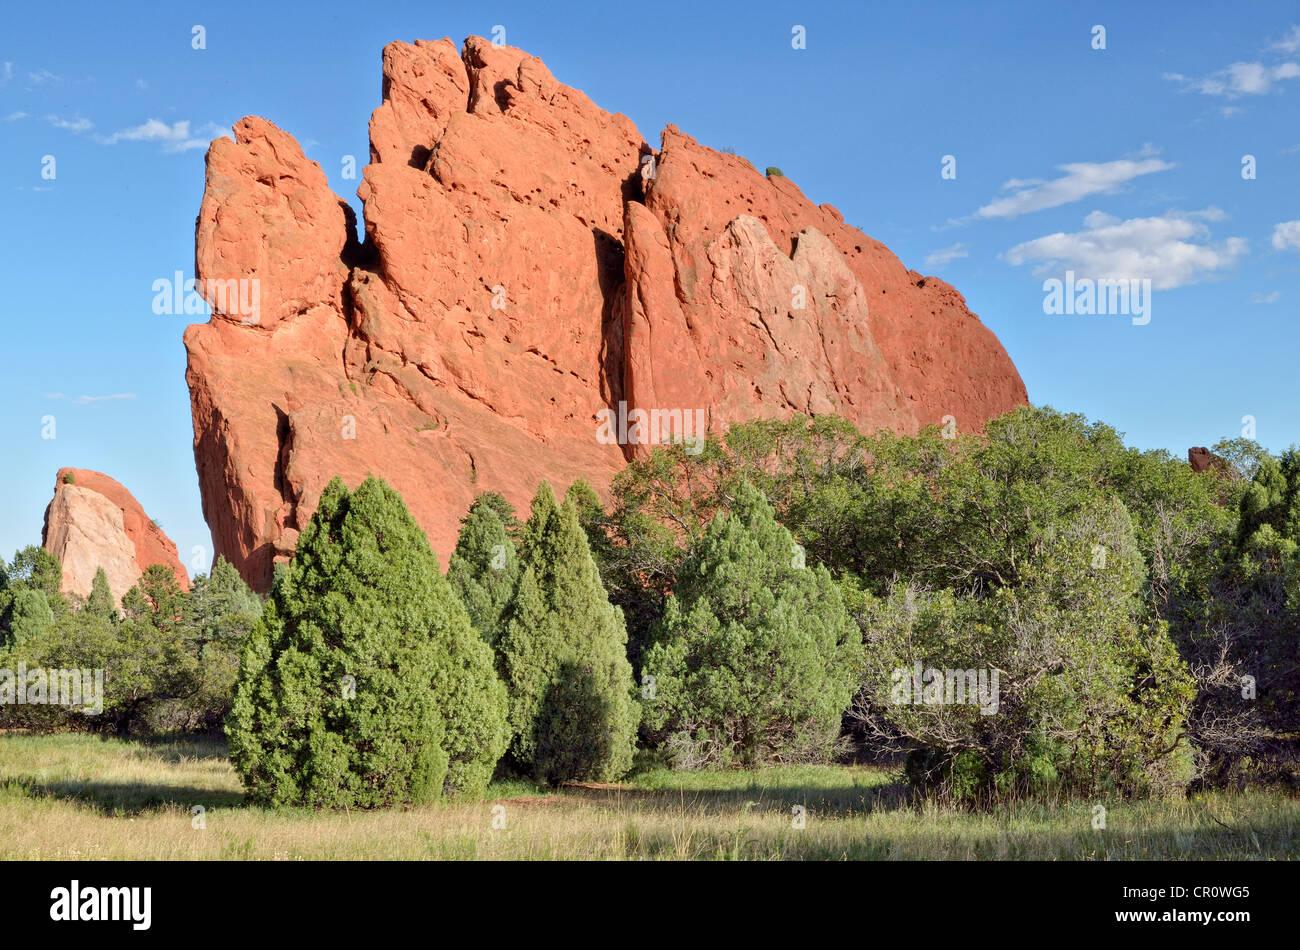 South Gate Rock, Garden of the Gods, red sandstone rocks, Colorado Springs, Colorado, USA - Stock Image